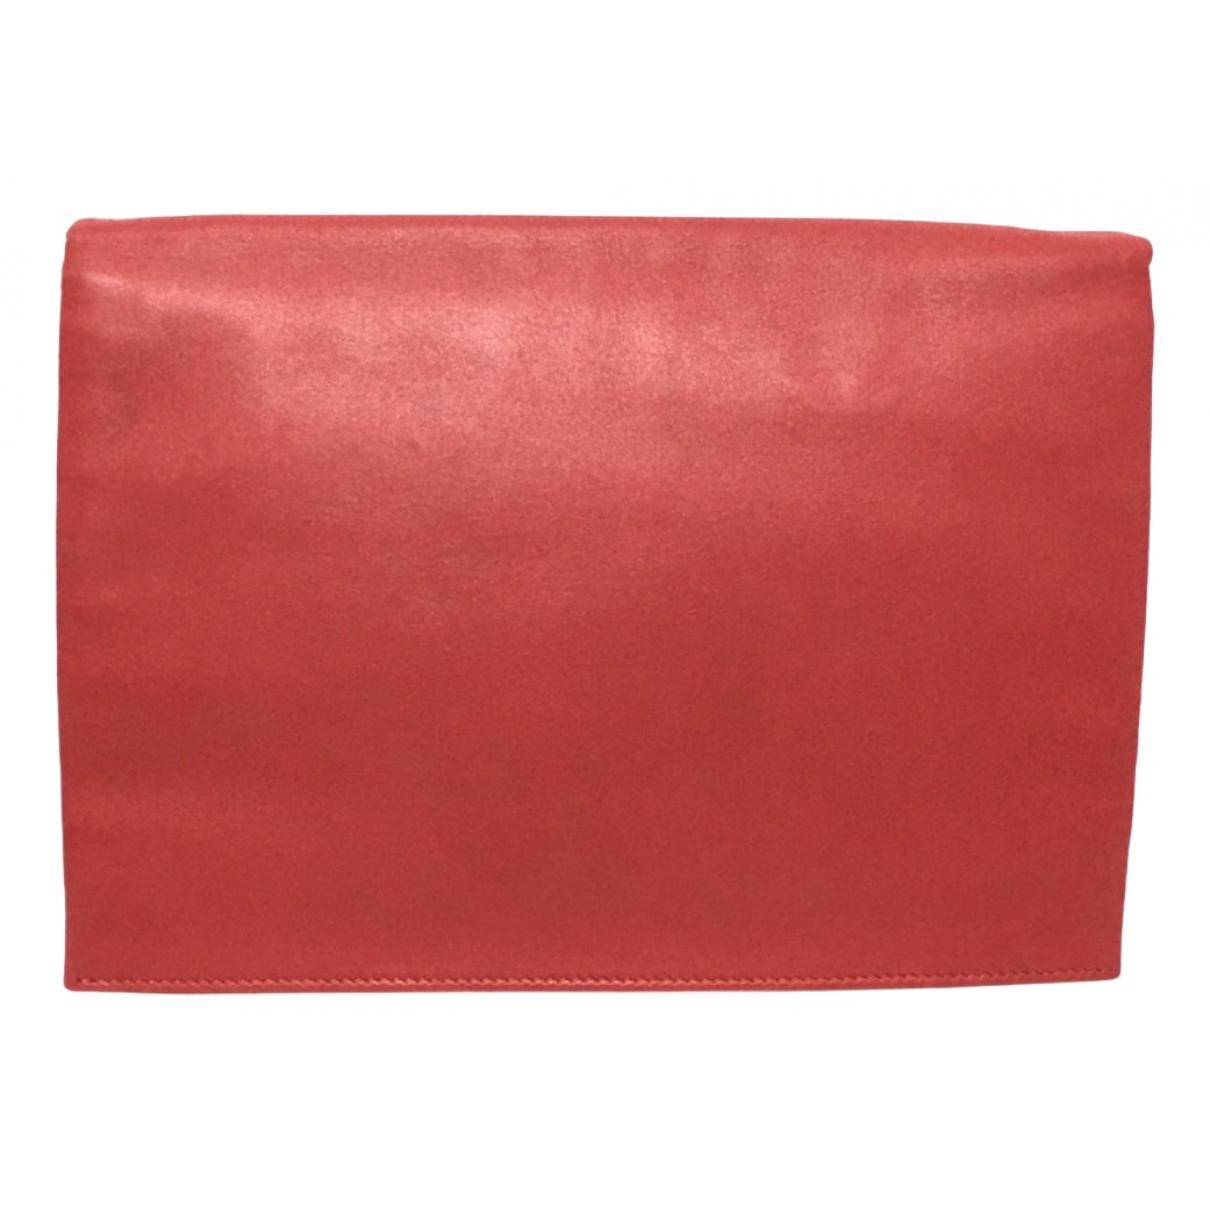 Celine \N Red Leather Clutch bag for Women \N